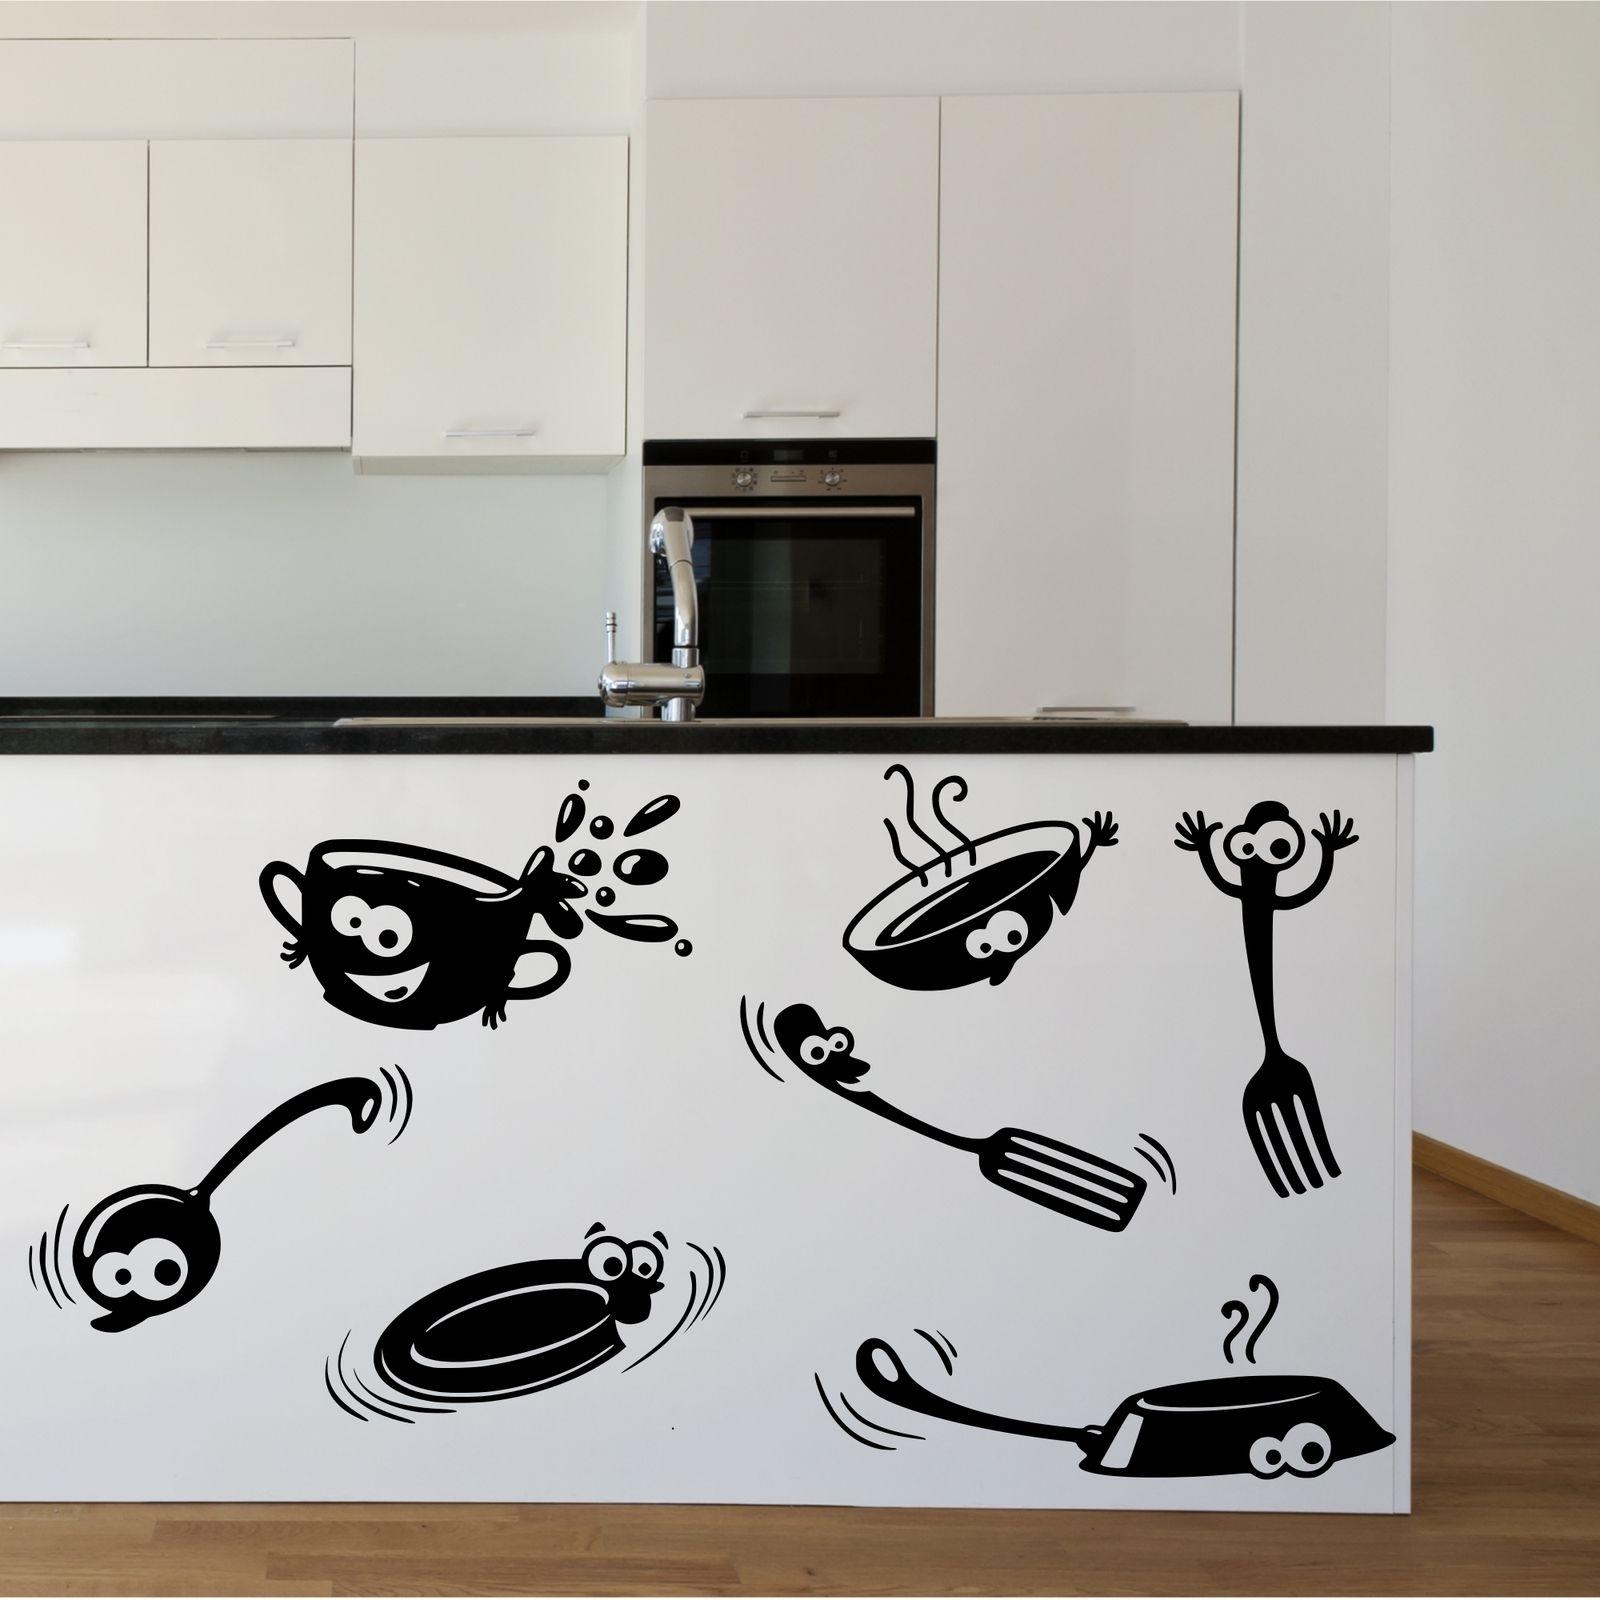 Kitchen Cupboard Cartoon Stickers Vinyl Wall Art Decal Transfer Inside Latest Stencil Wall Art (View 17 of 20)